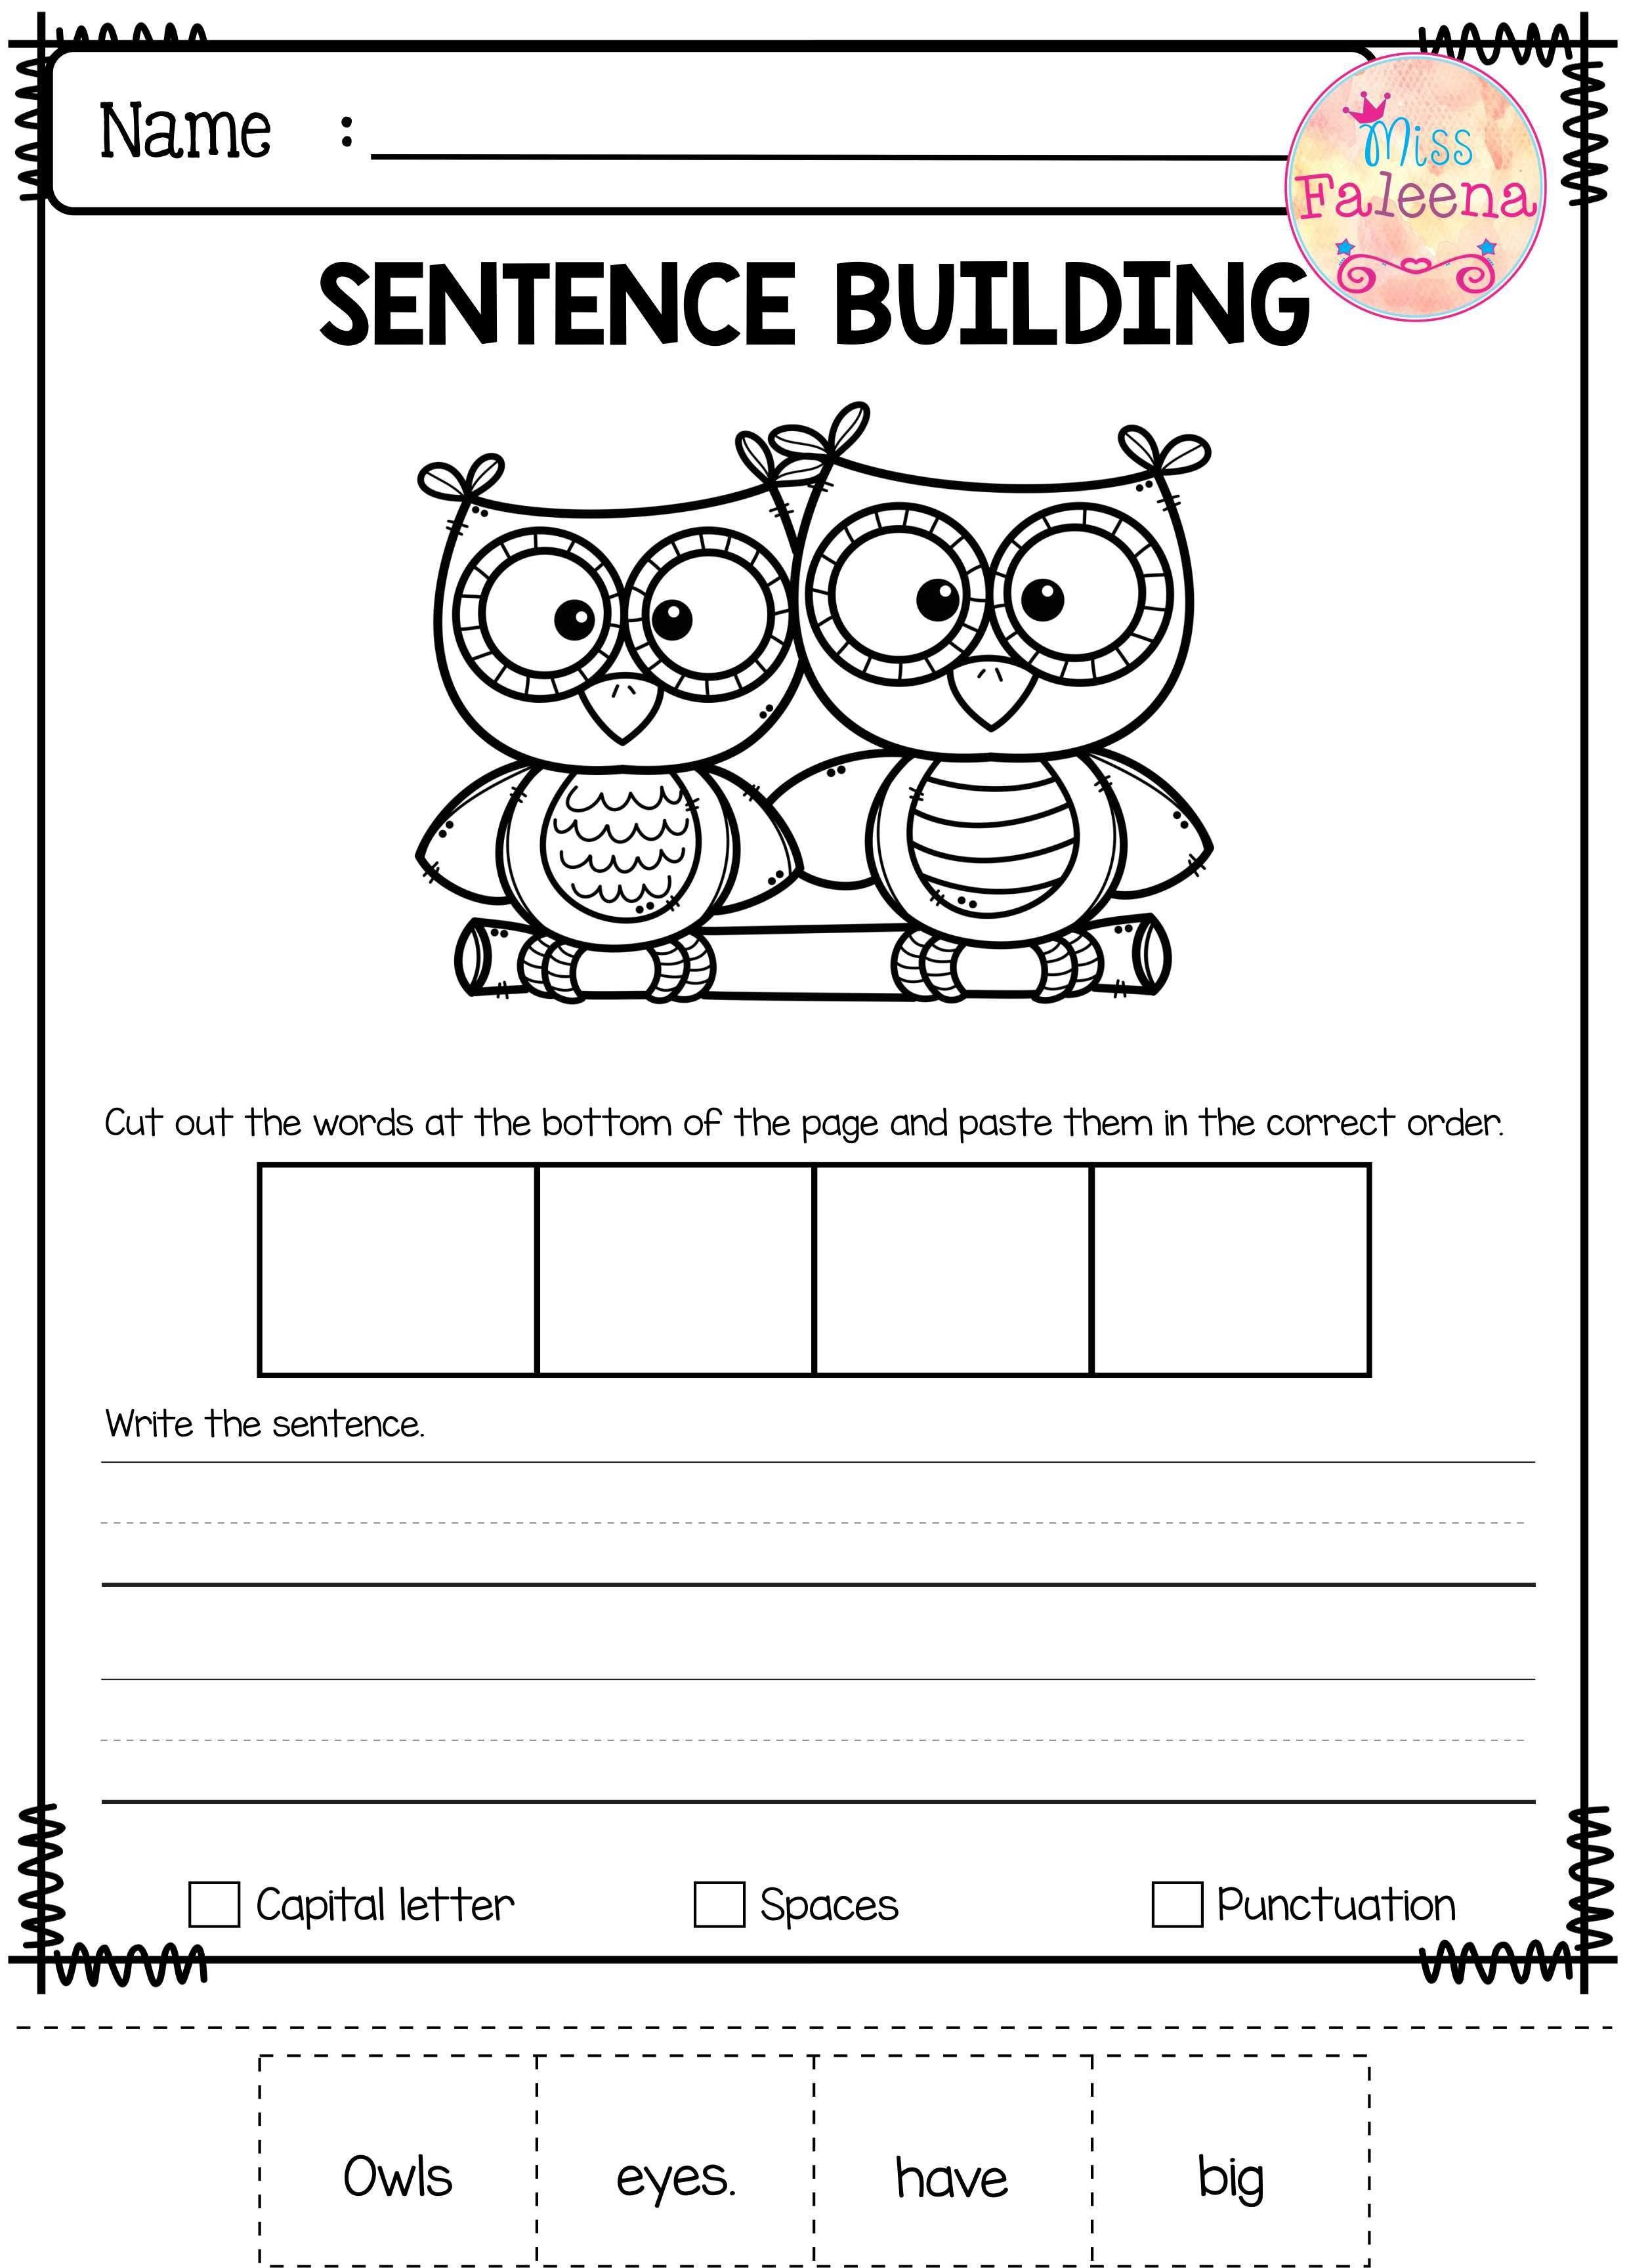 august sentence building kindergarten worksheets thinking skills and writing skills. Black Bedroom Furniture Sets. Home Design Ideas